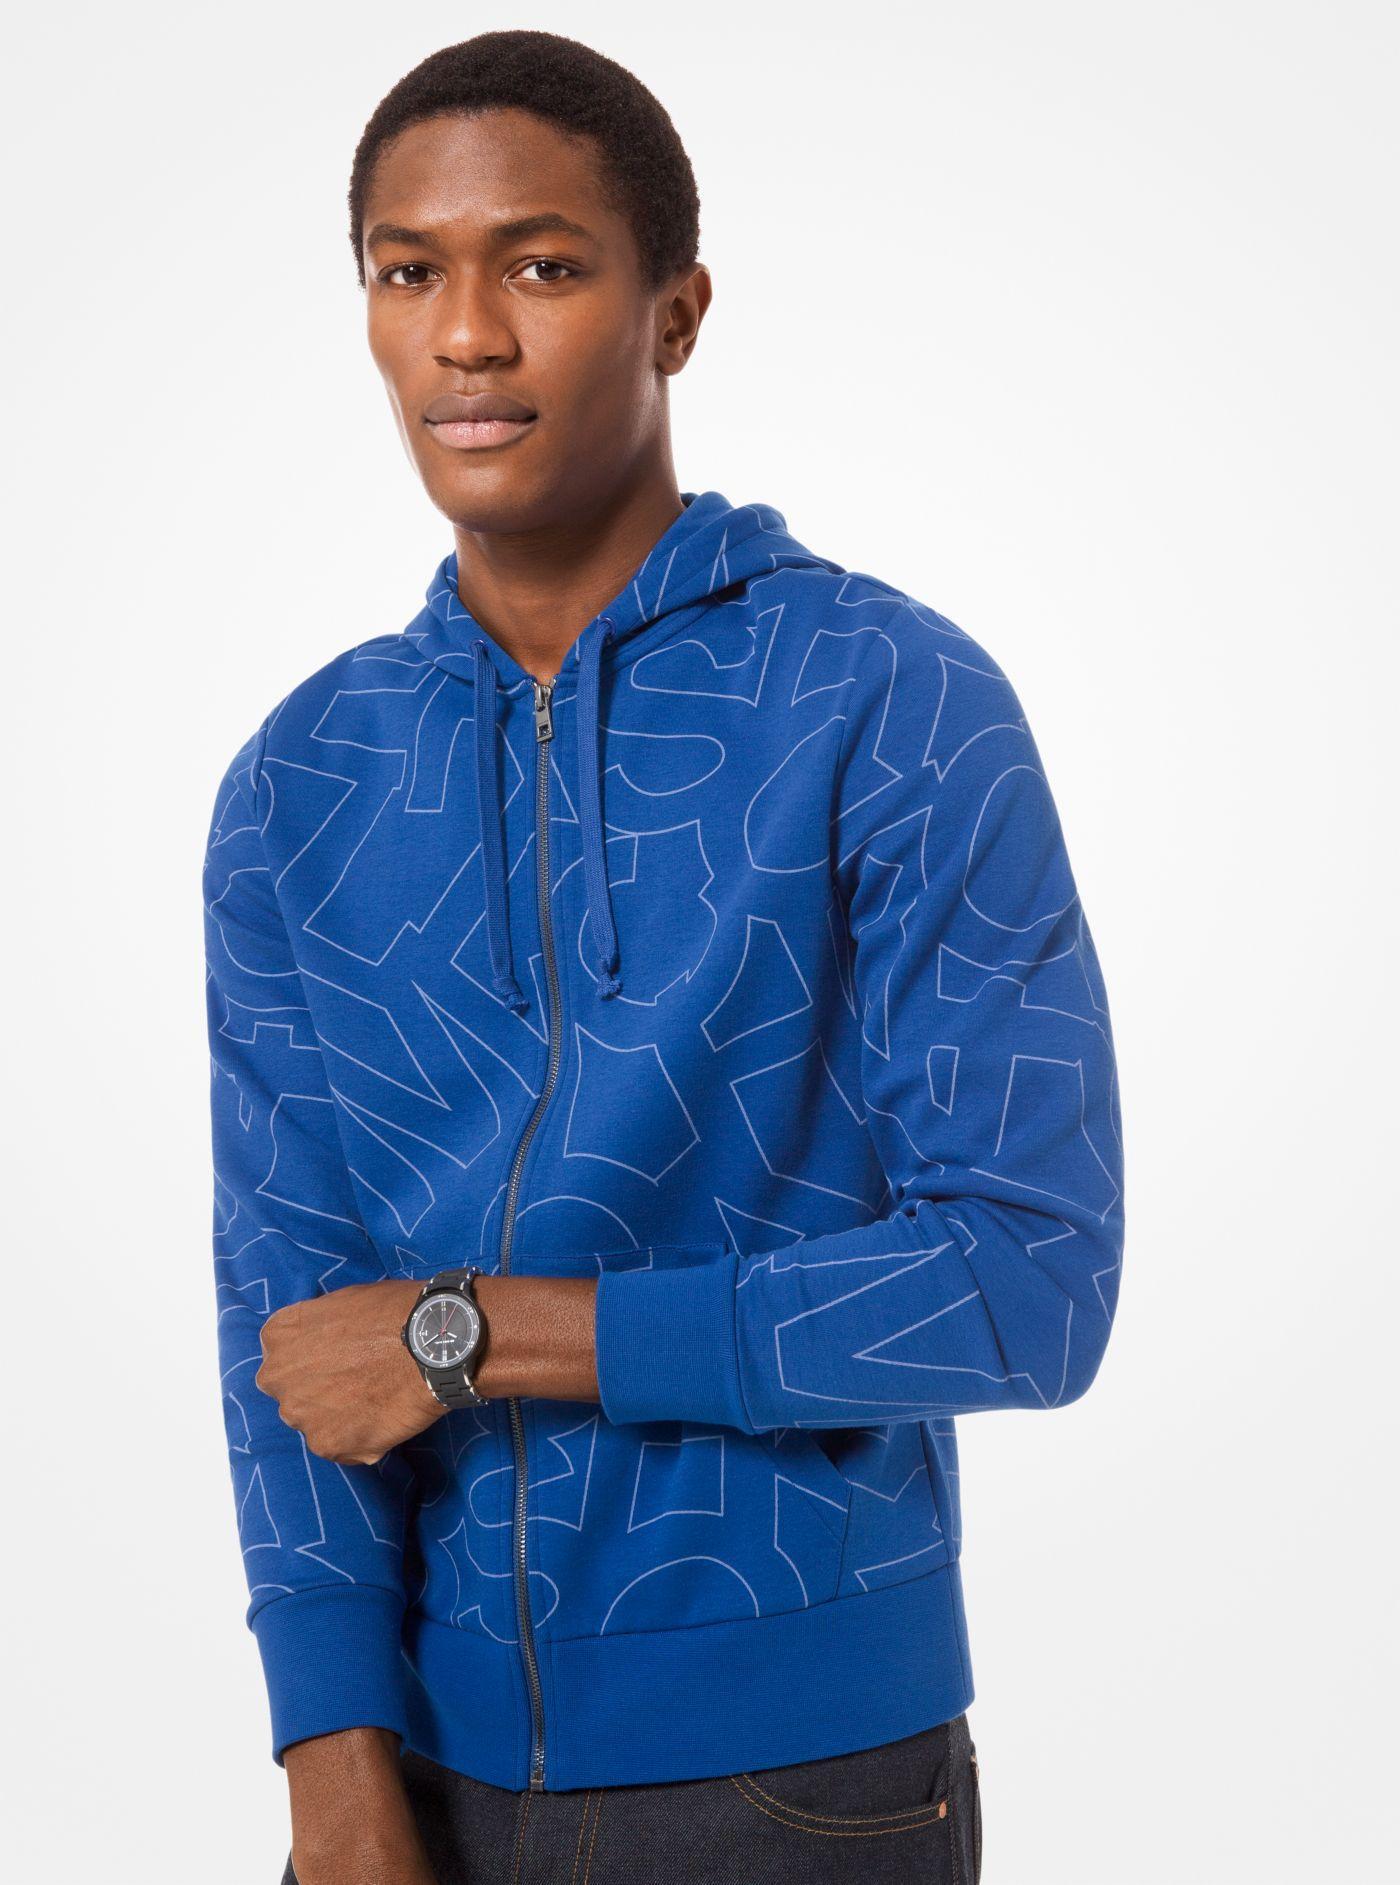 8e002887f4b4c Michael Kors Graphic Logo Print Cotton-blend Zip-up Hoodie in Blue ...